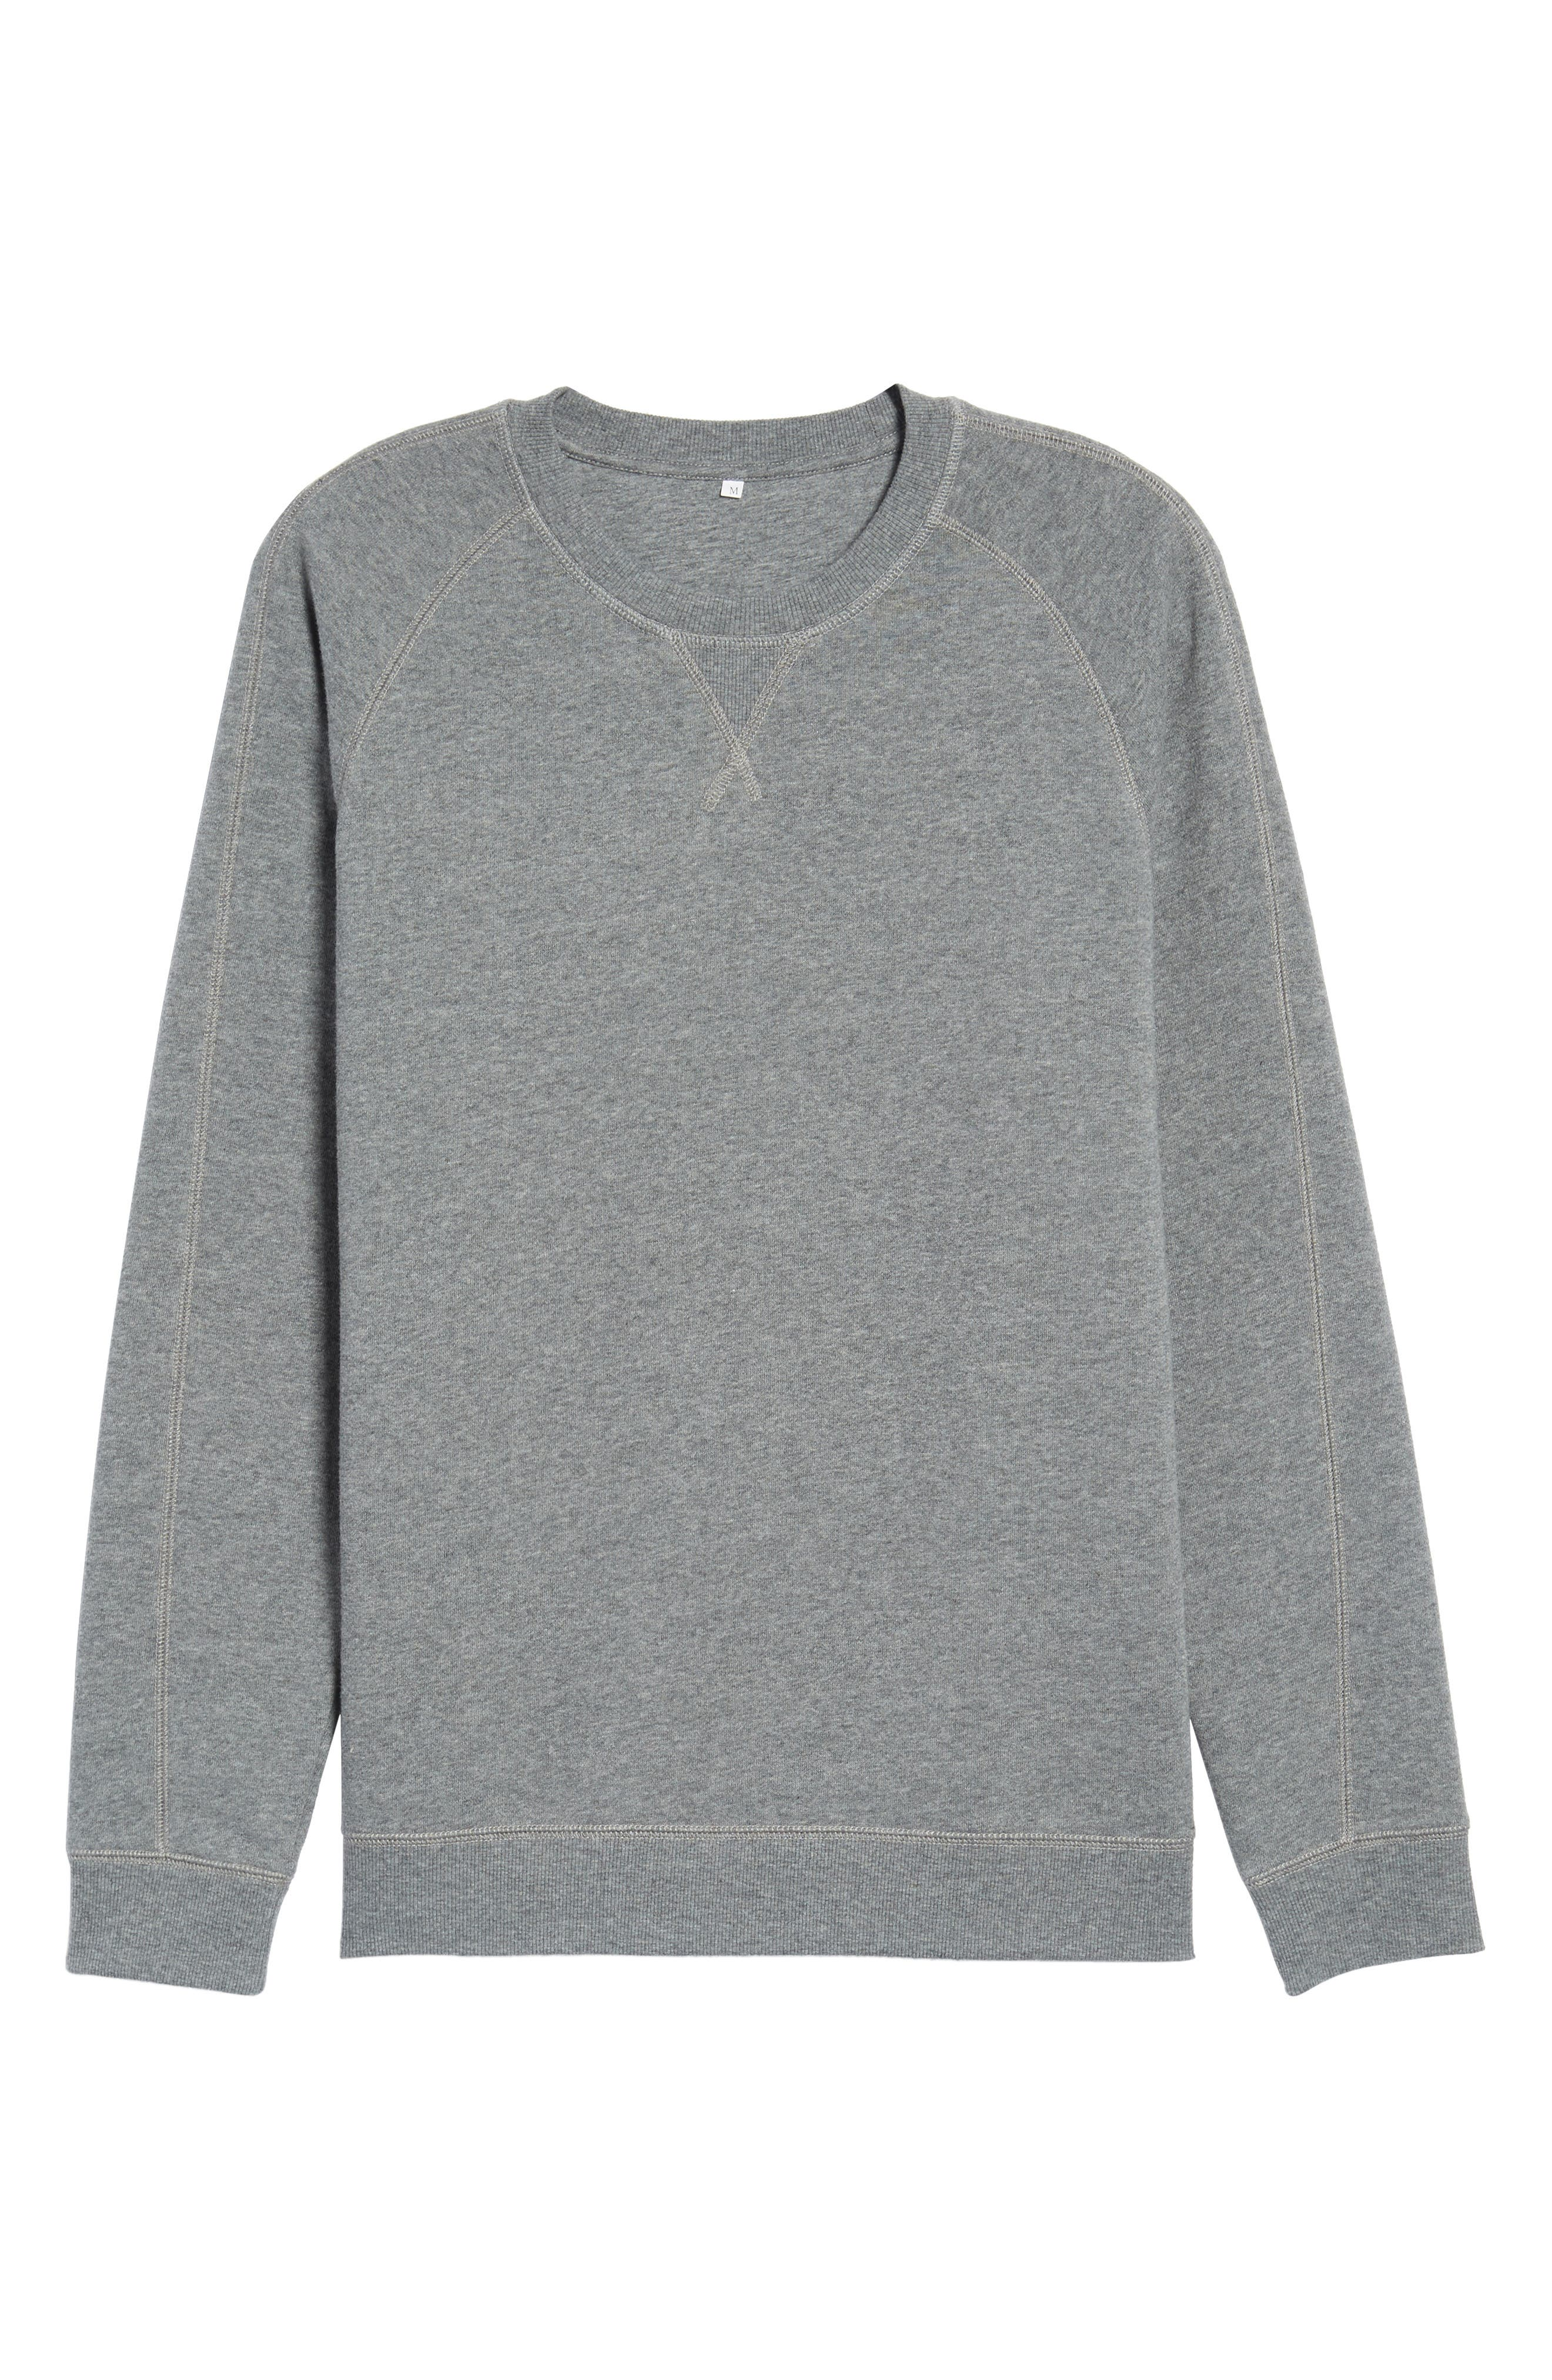 Fleece Sweatshirt,                             Alternate thumbnail 6, color,                             Grey Paloma Heather